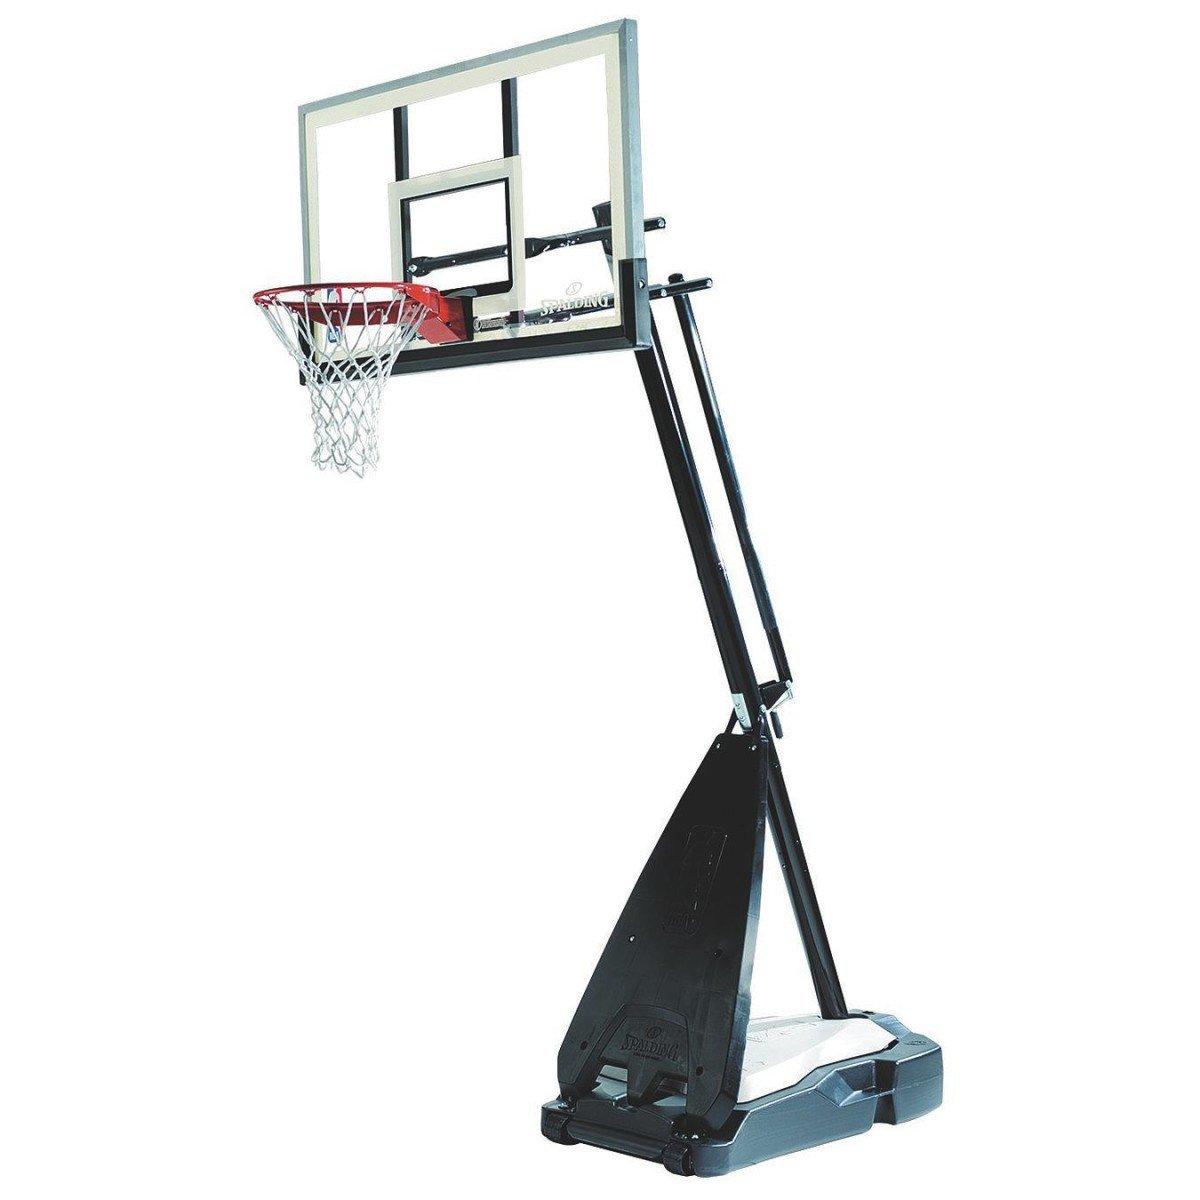 Spalding NBA Hybrid Portable Basketball System - 54'' Acrylic Backboard